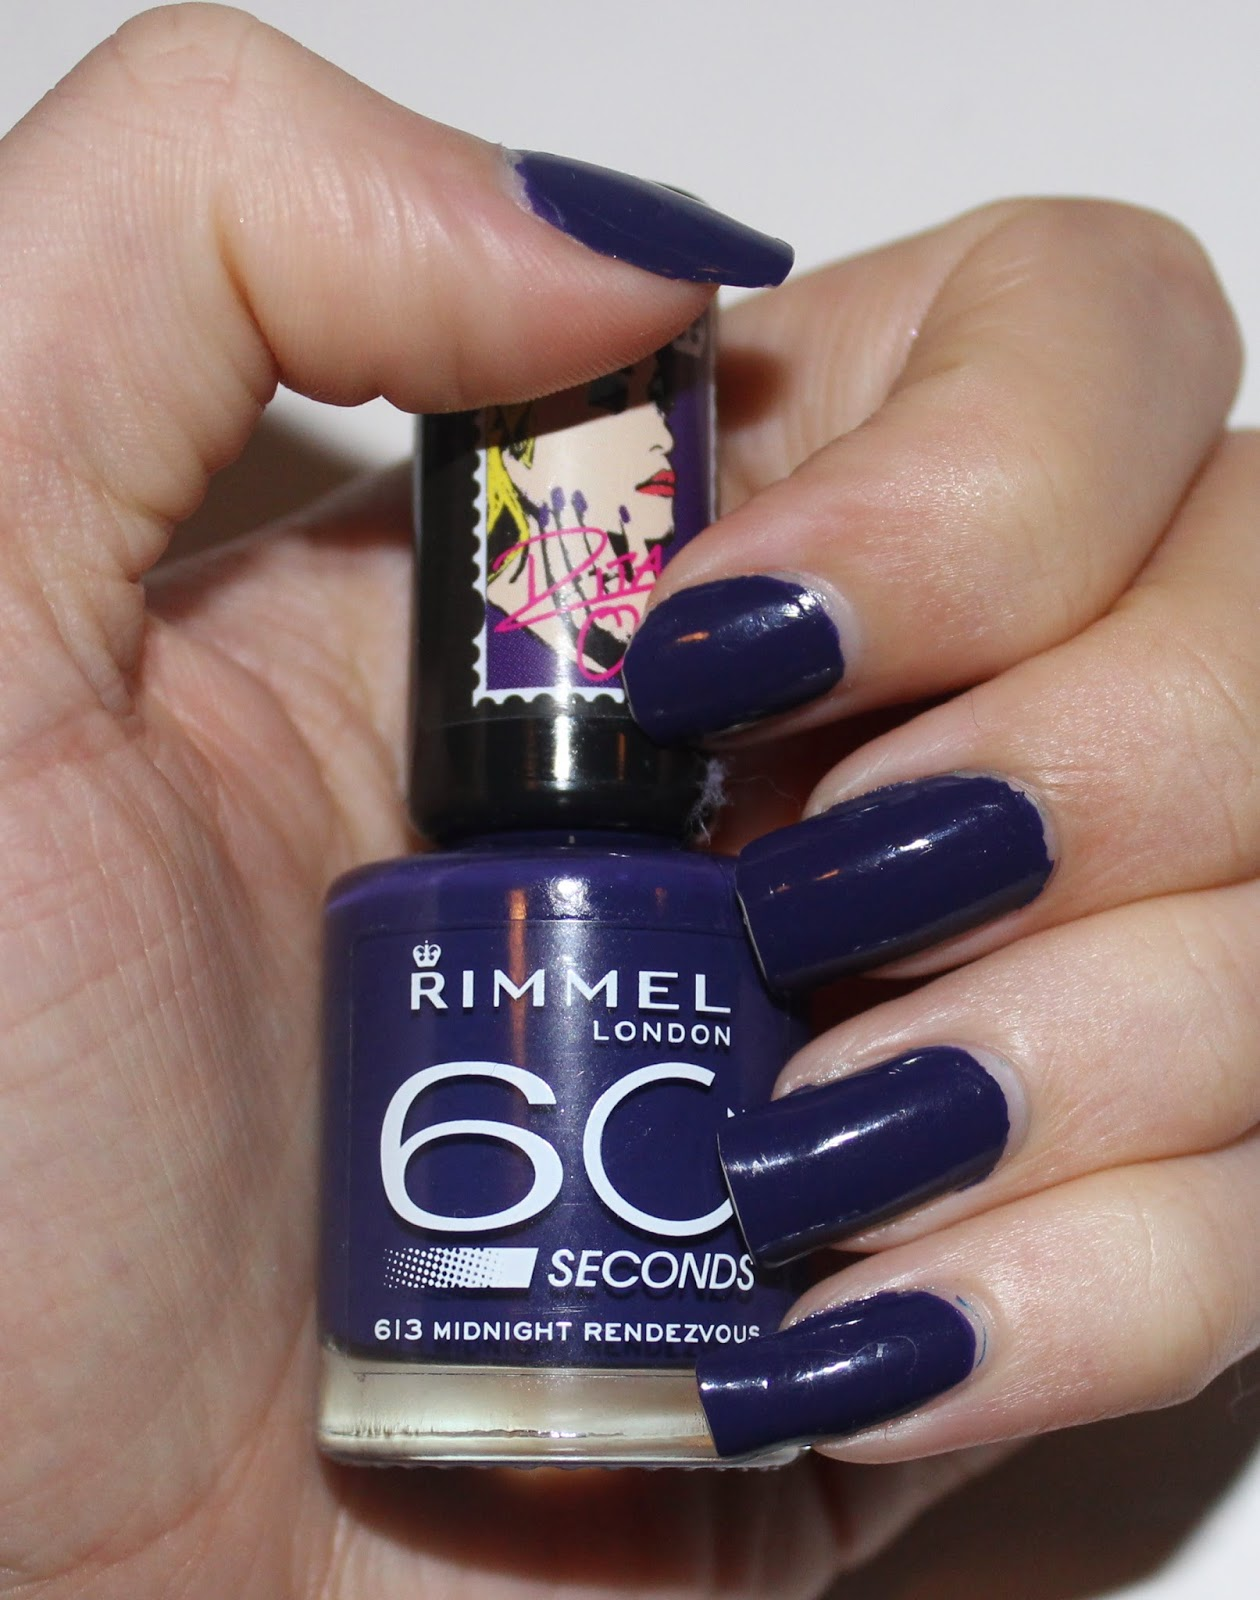 Rimmel London x Rita Ora 60 Seconds Nail Polish in Midnight Rendezvous